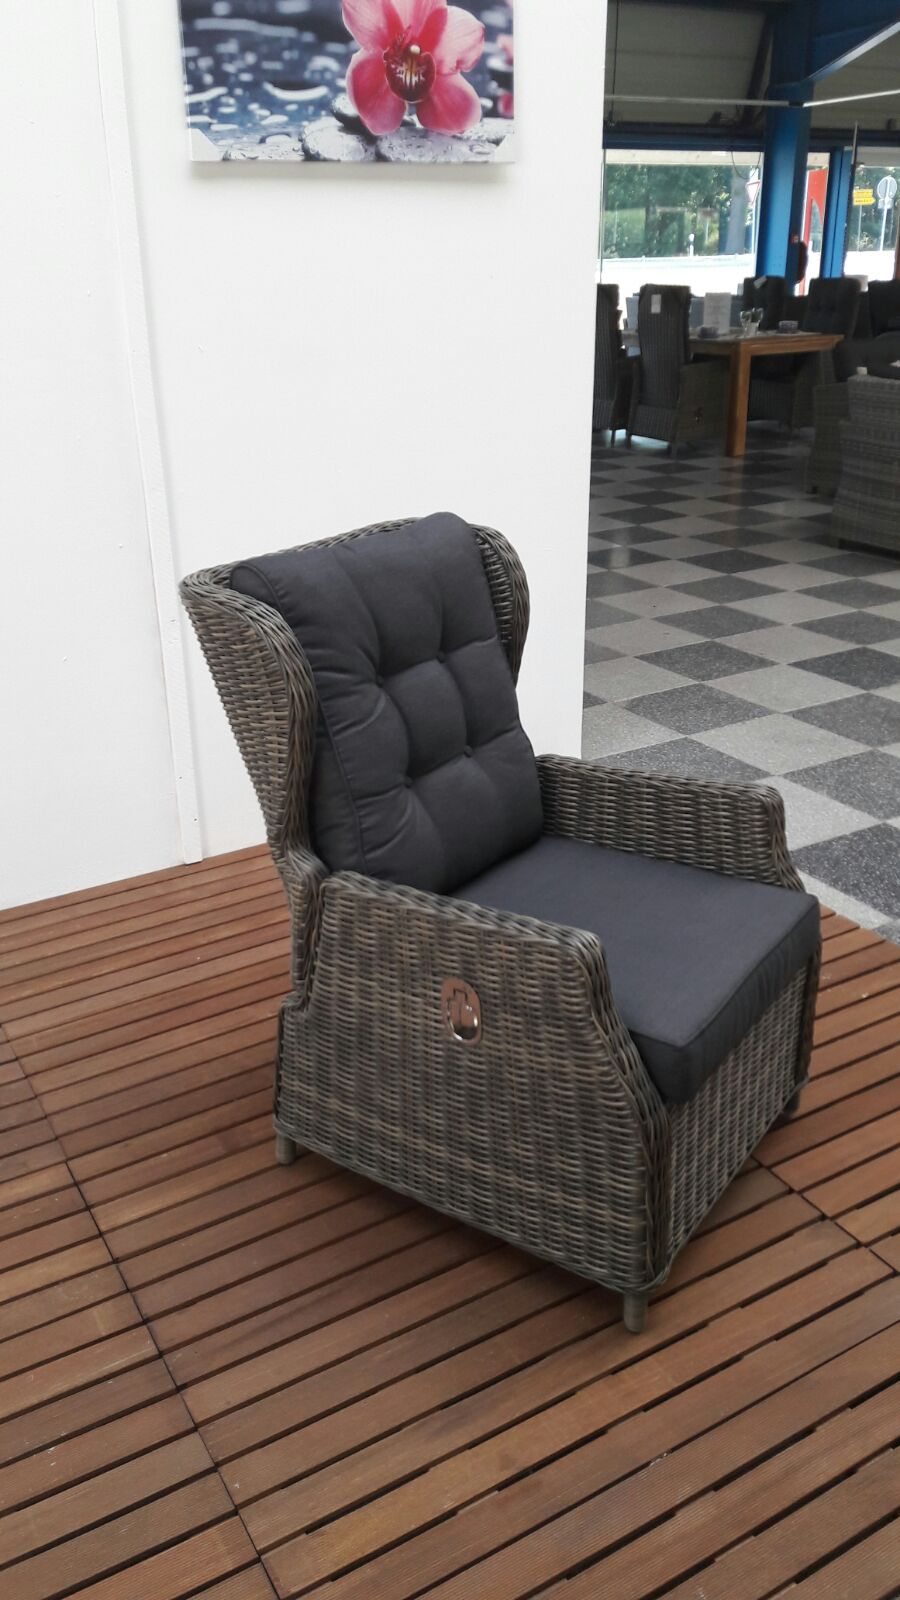 verstellbare lounge sessel valencia sandgrau meliert garten m bel f r dich. Black Bedroom Furniture Sets. Home Design Ideas